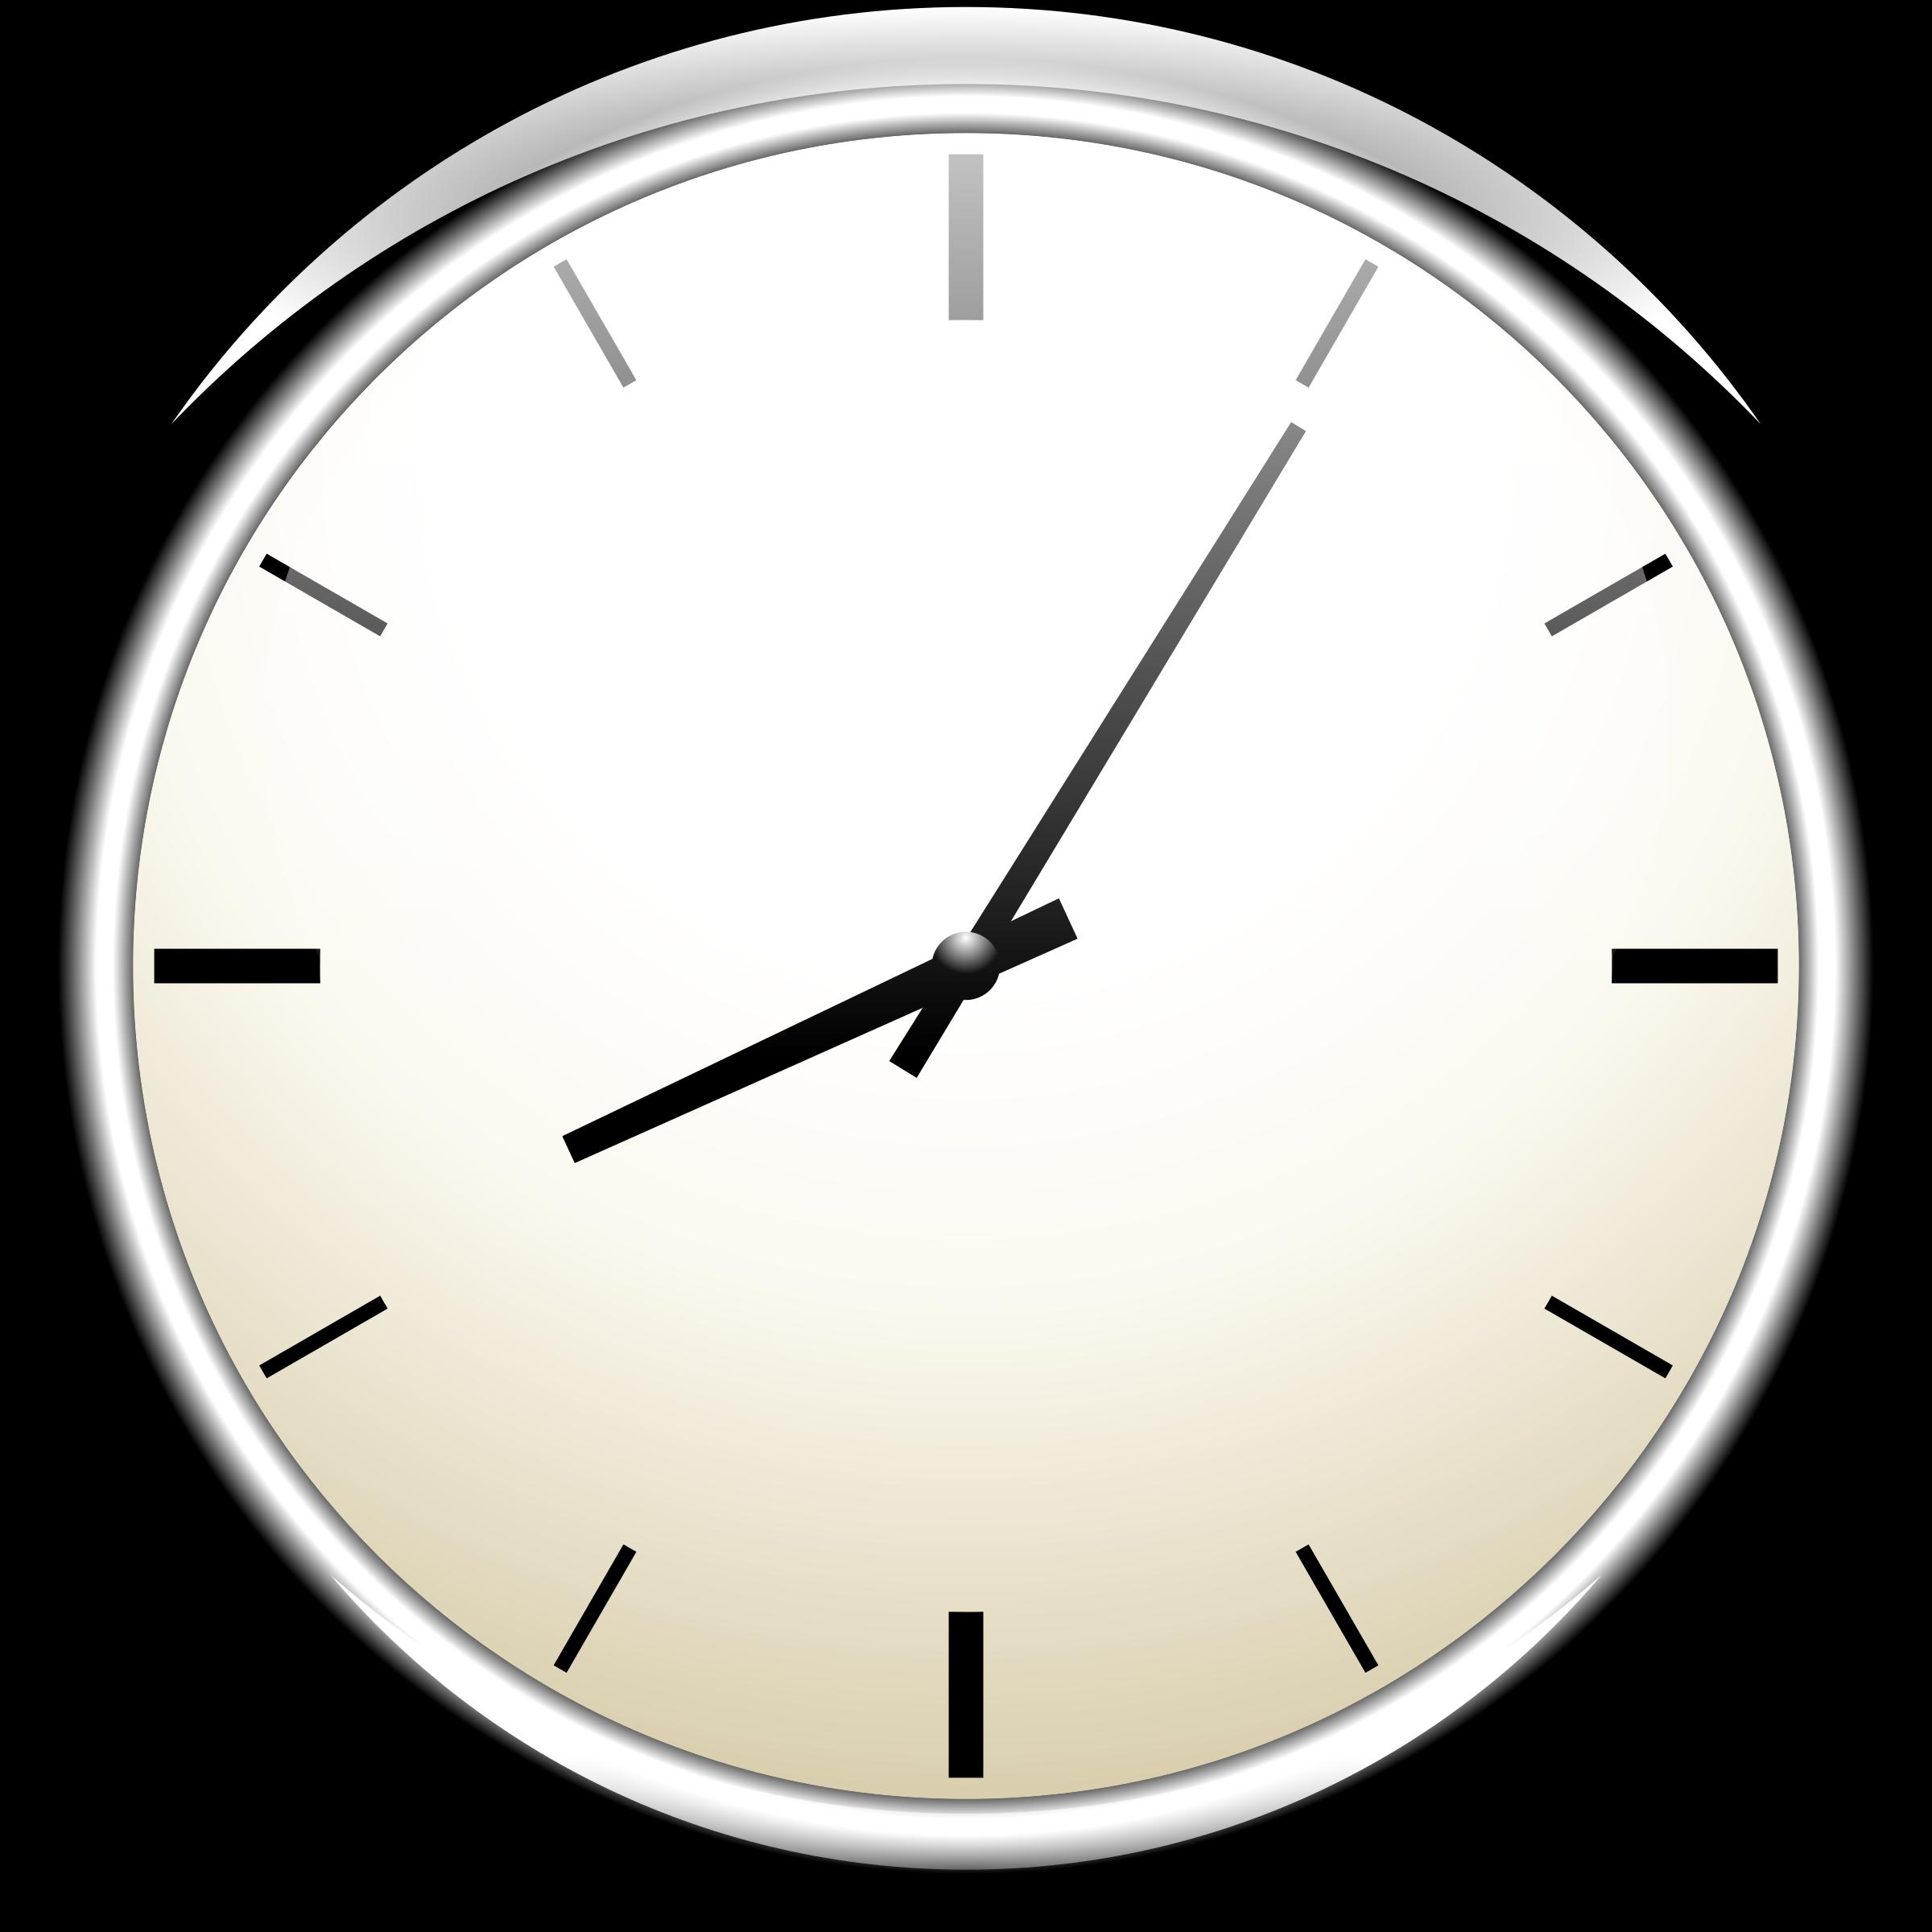 picture transparent library Clock calendar big image. Clocks clipart oval.